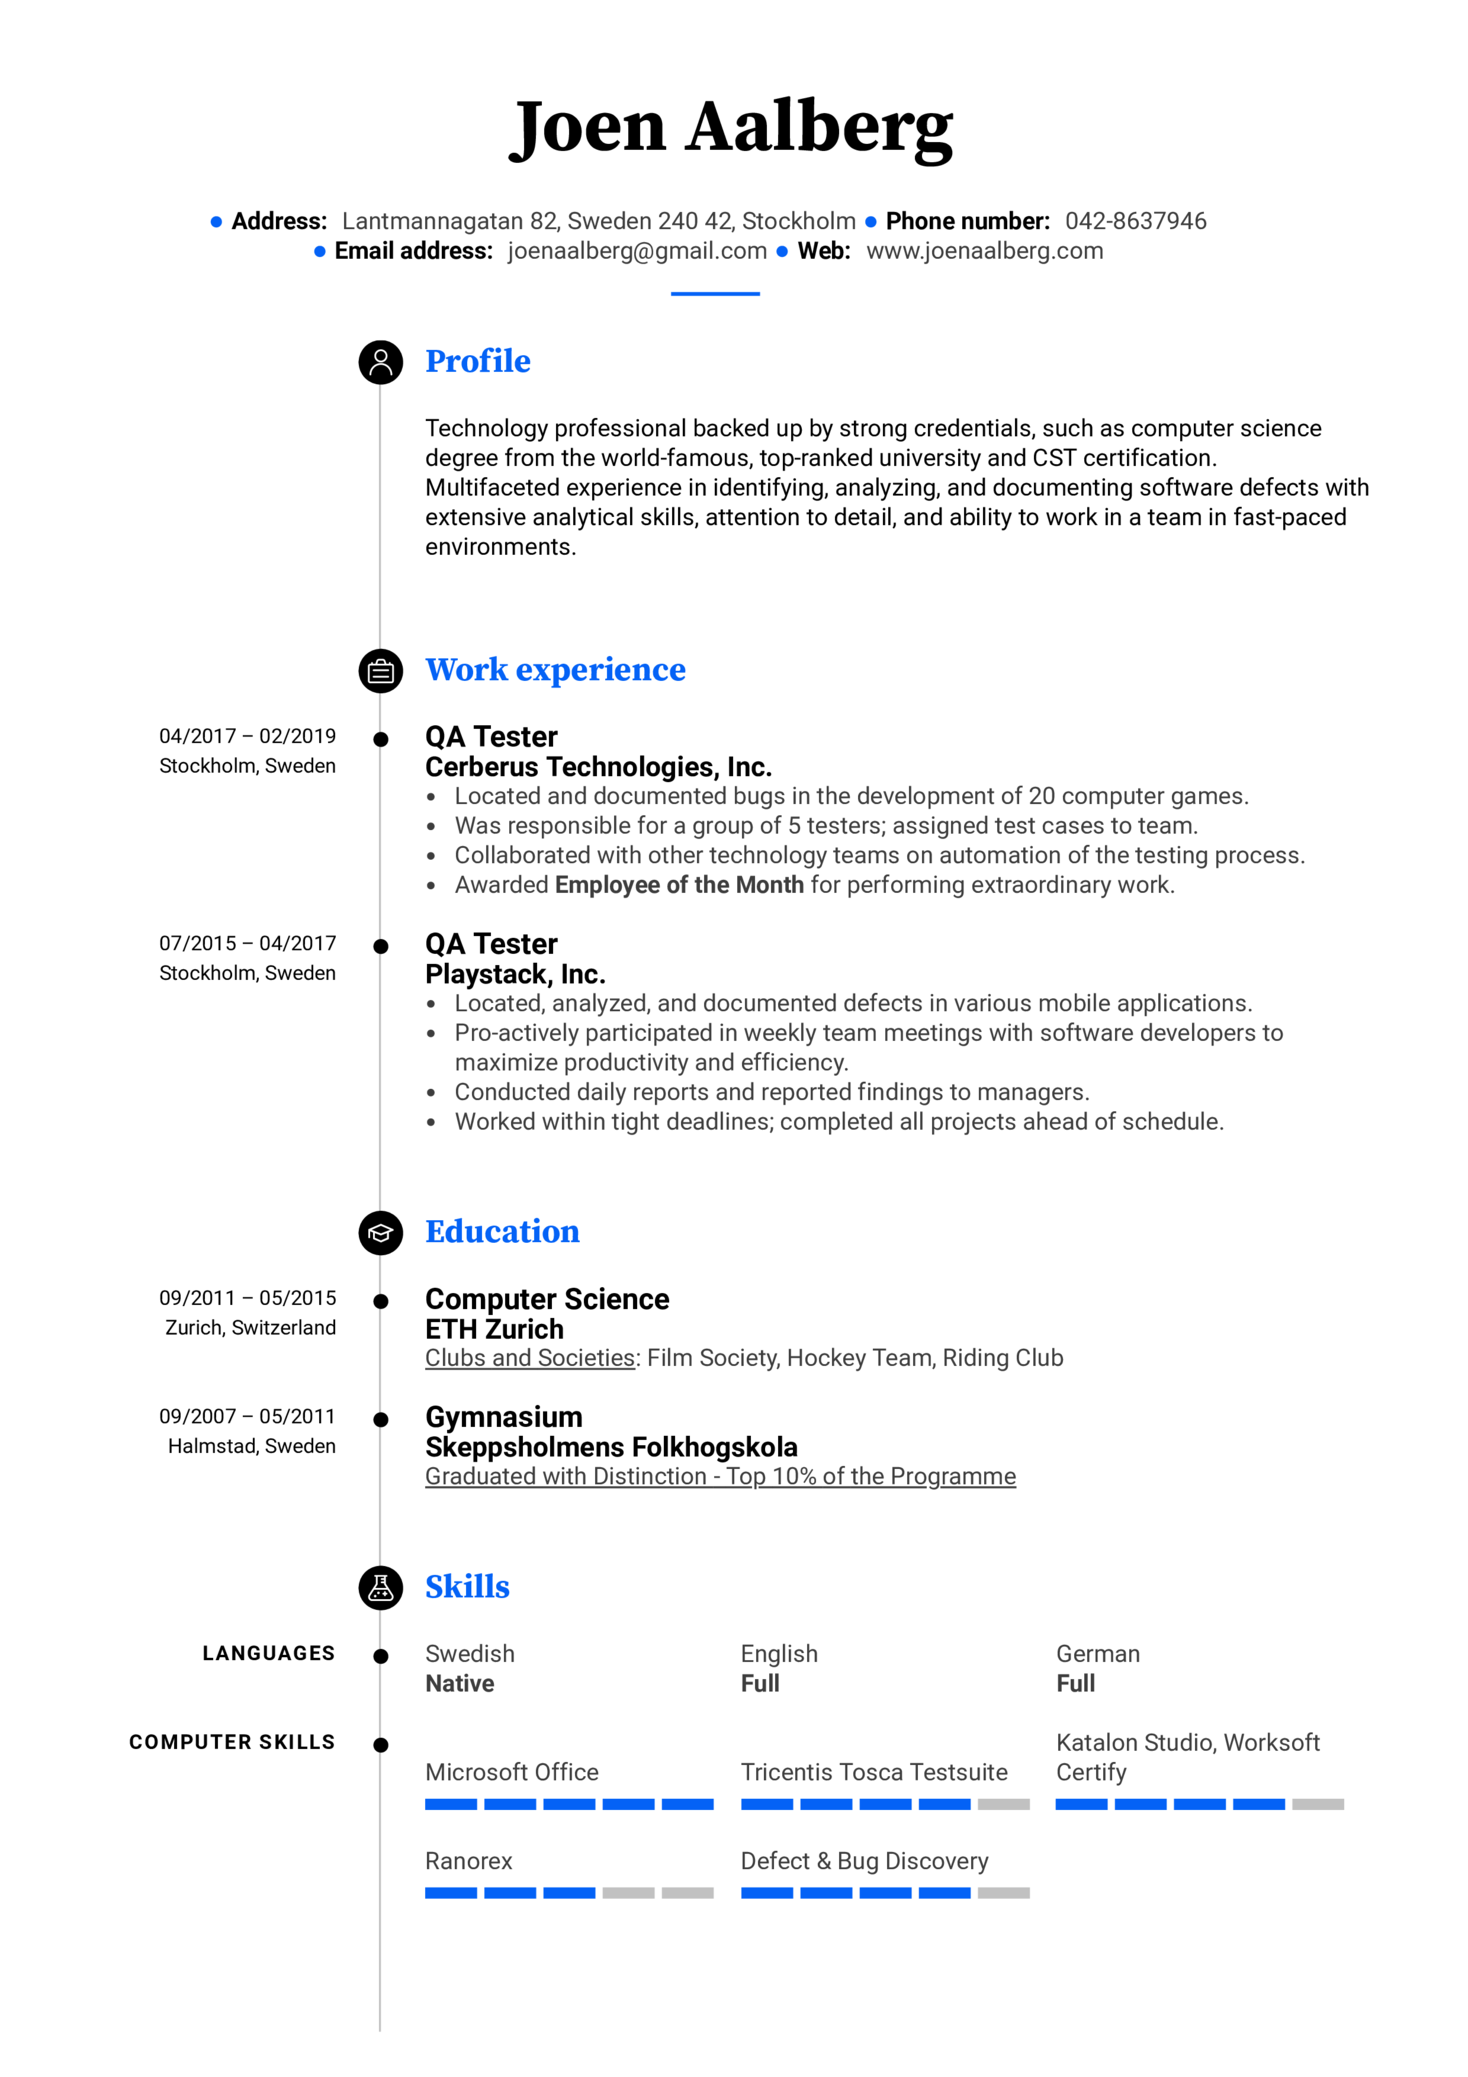 QA Tester Resume Example (Parte 1)